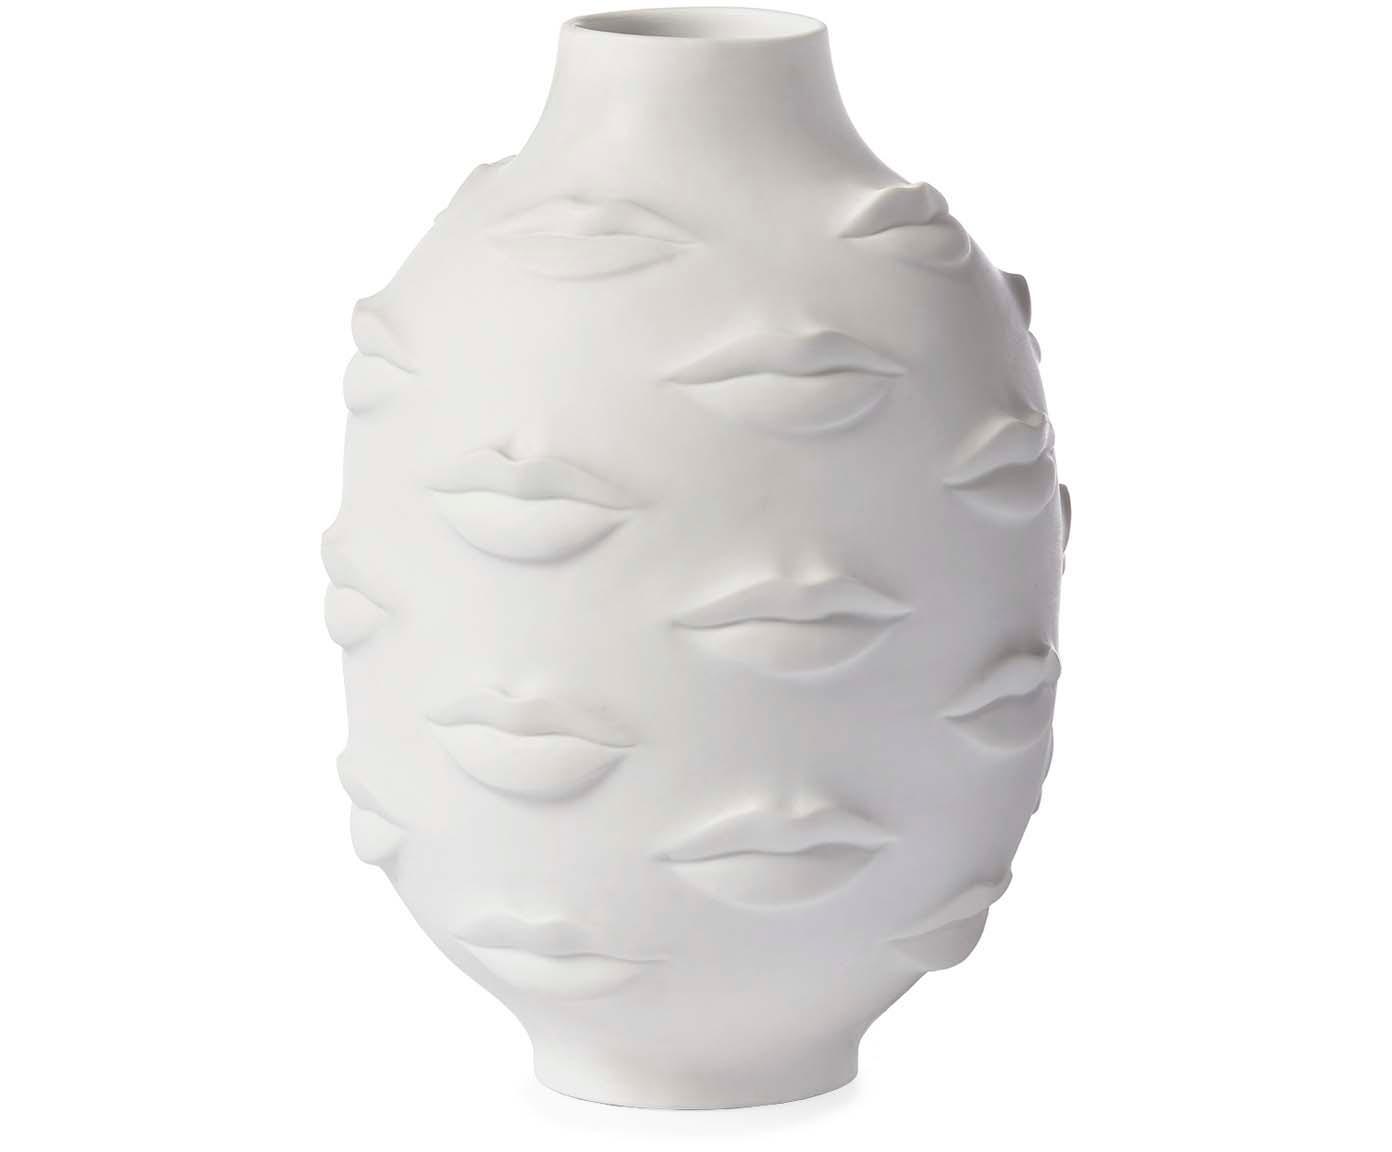 Design-Vase Gala aus Porzellan, Porzellan, Weiss, Ø 15 x H 25 cm